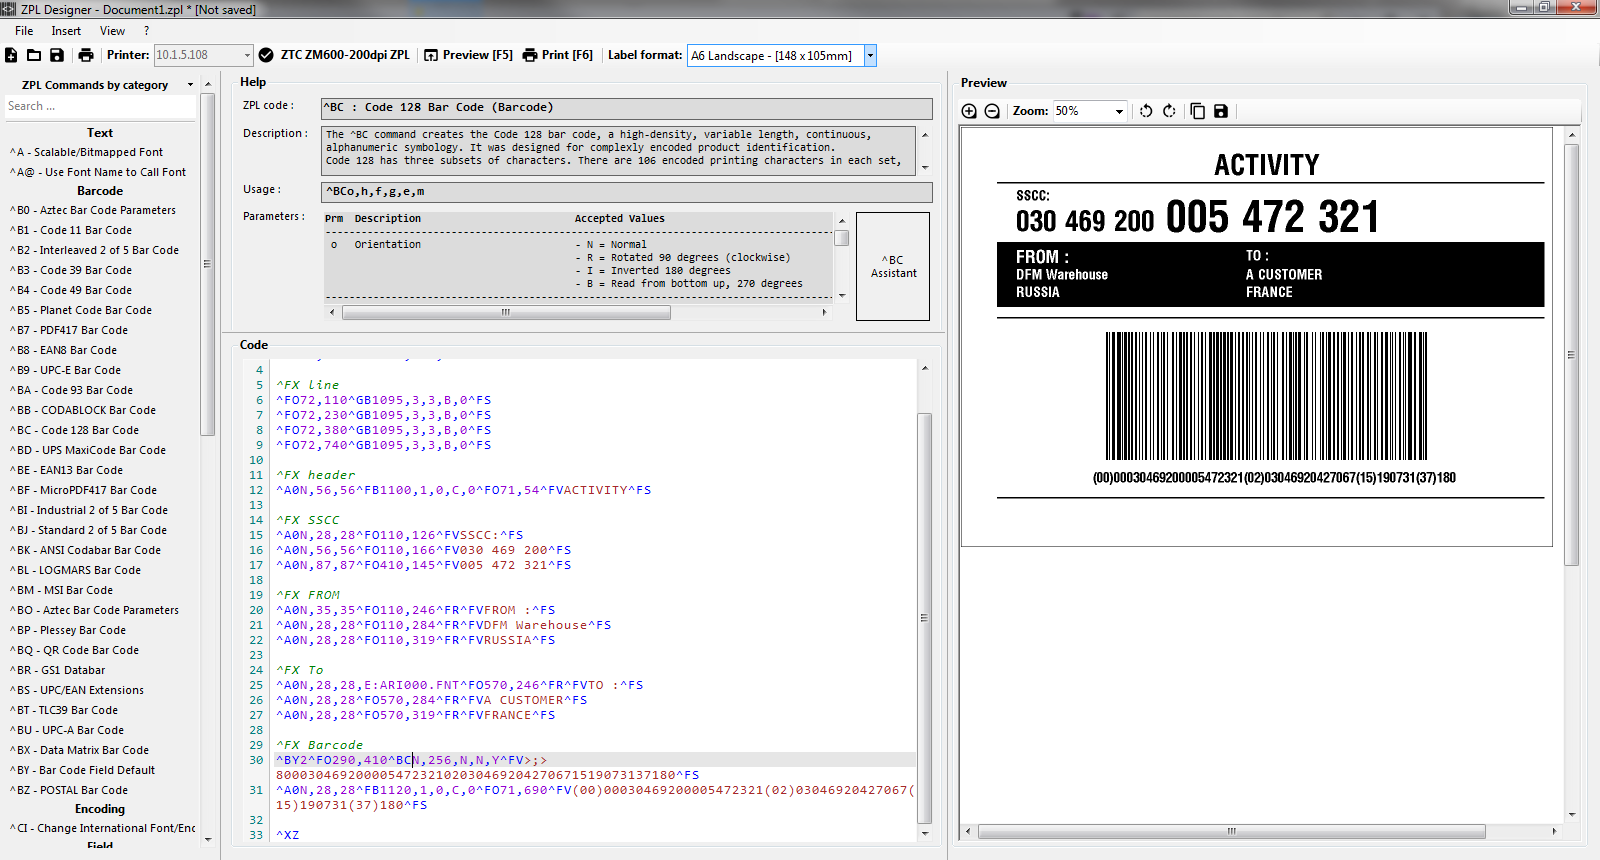 Download the lastest version of ZPLDesigner